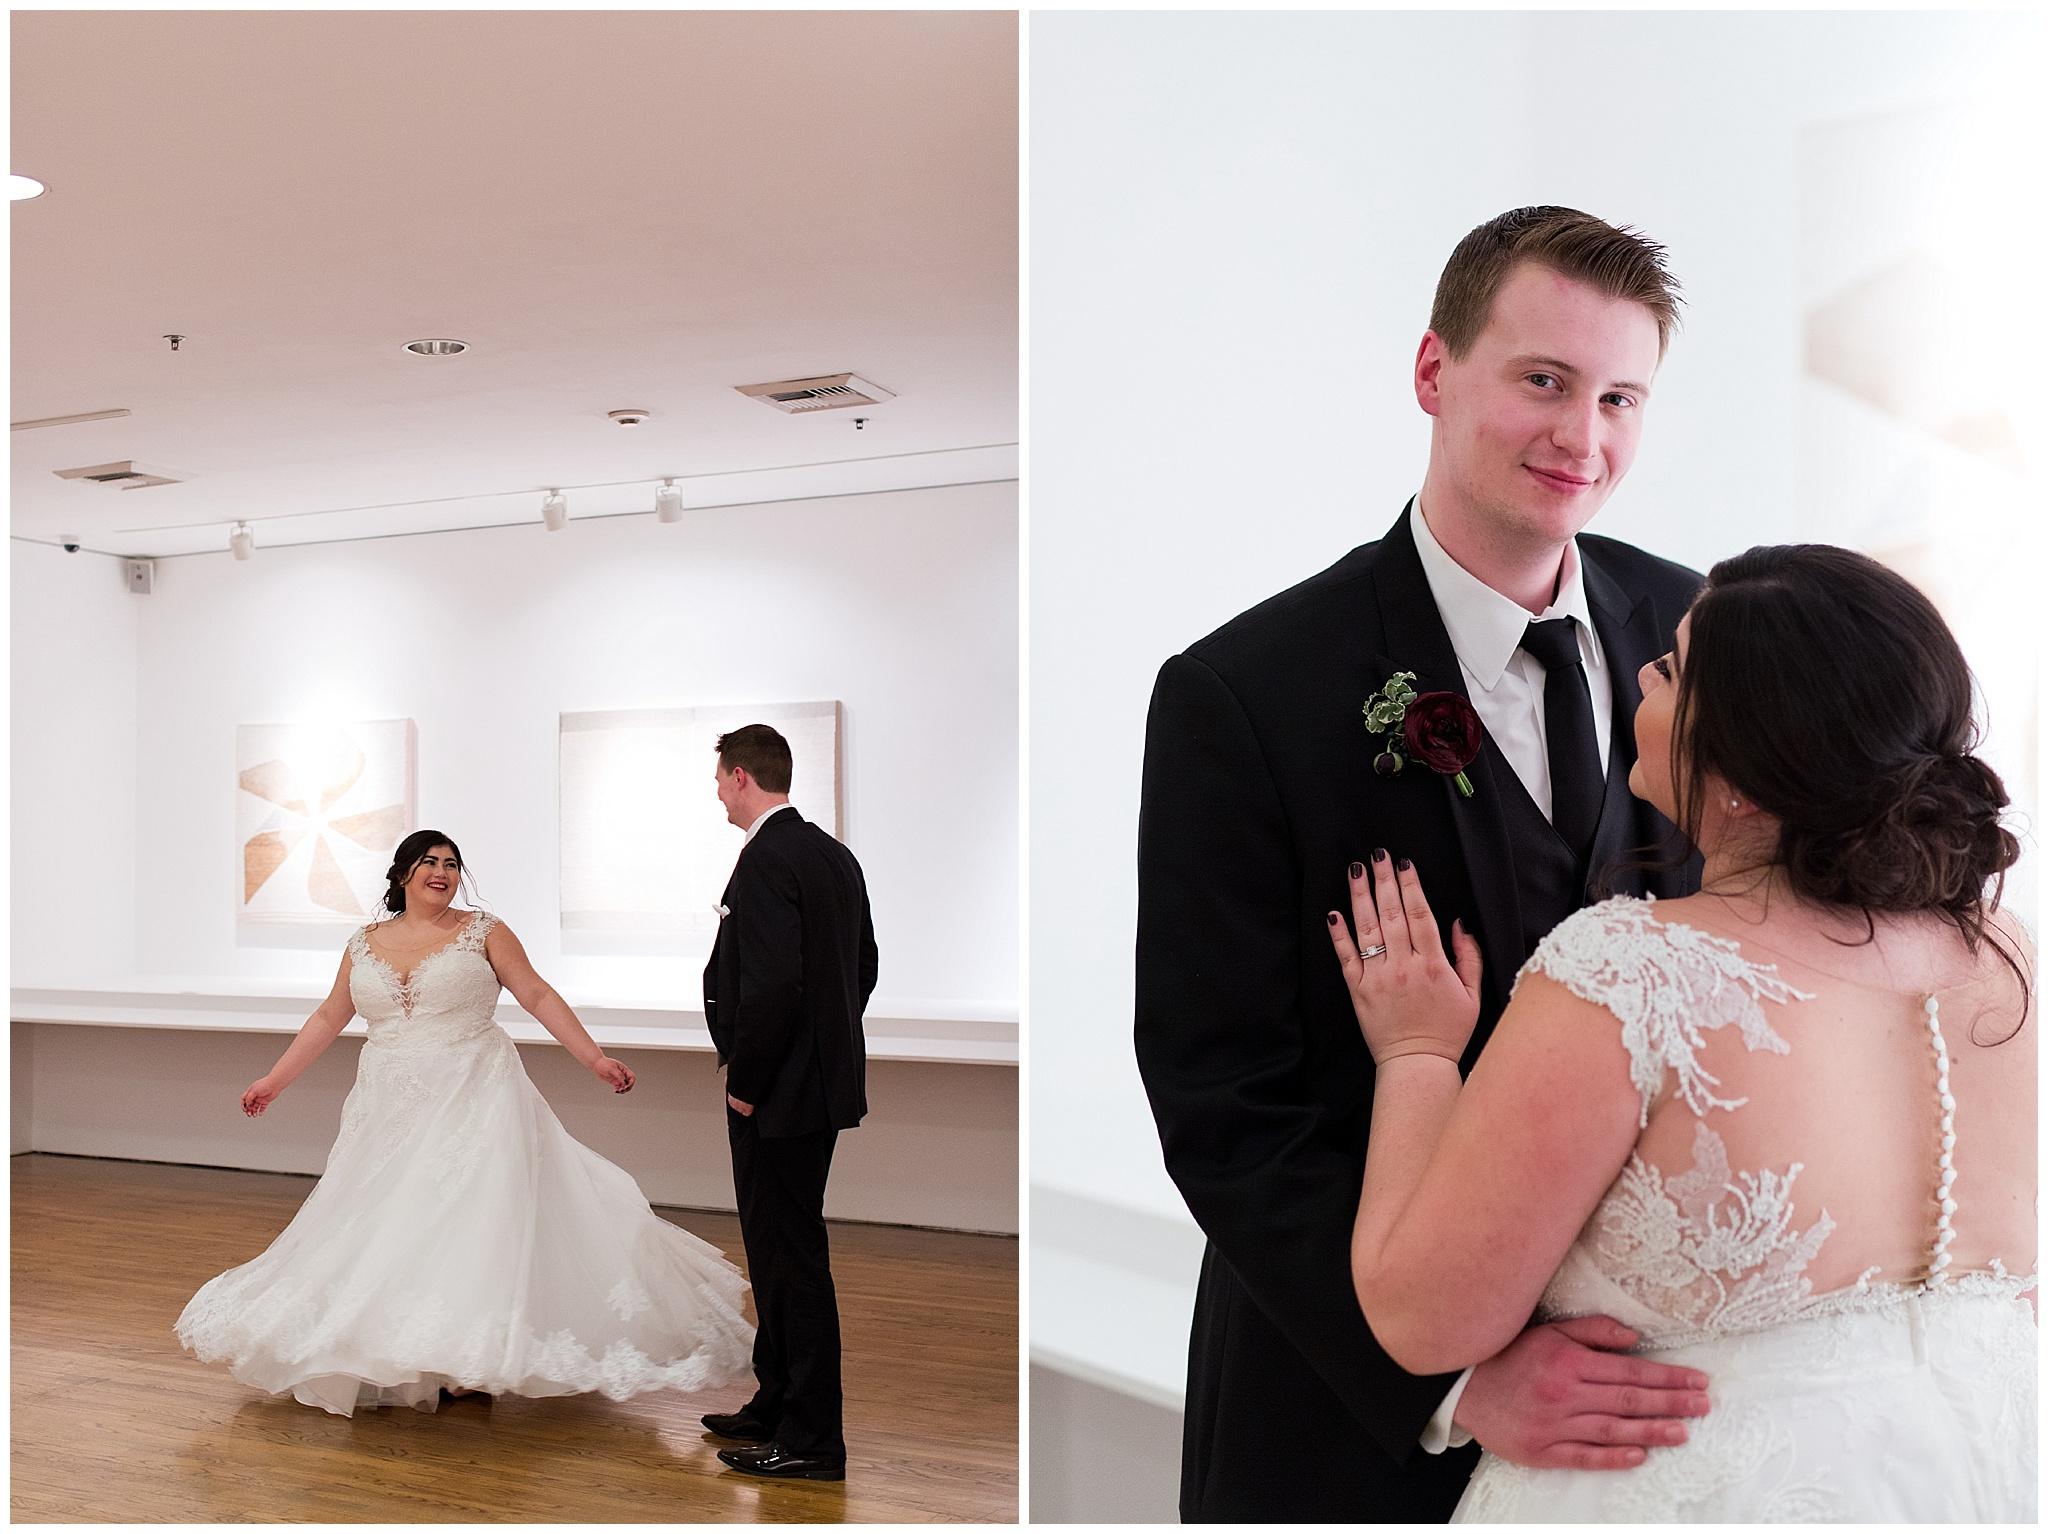 Carol_and_Grant_Wedding_3-3-18-8480.jpg